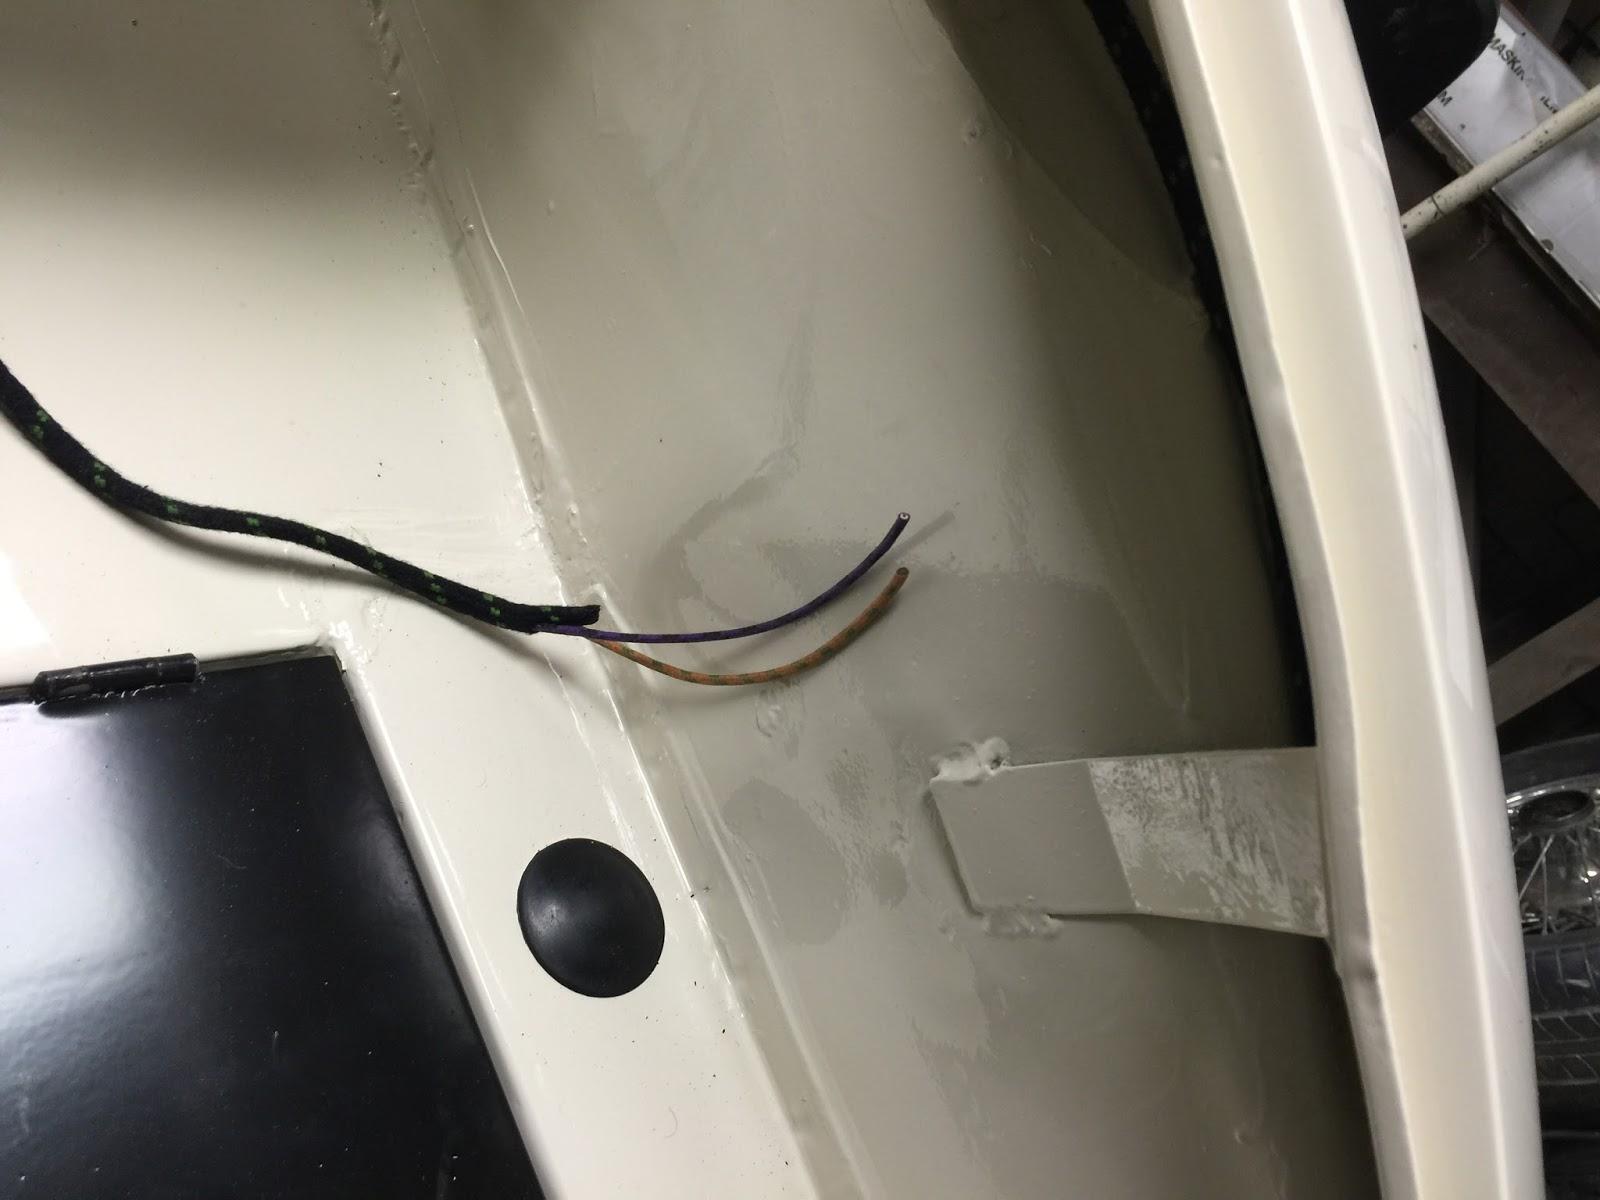 Jaguar Xk150 Electrics Ots Restoration Wiring Harness The Route For Rear Loom